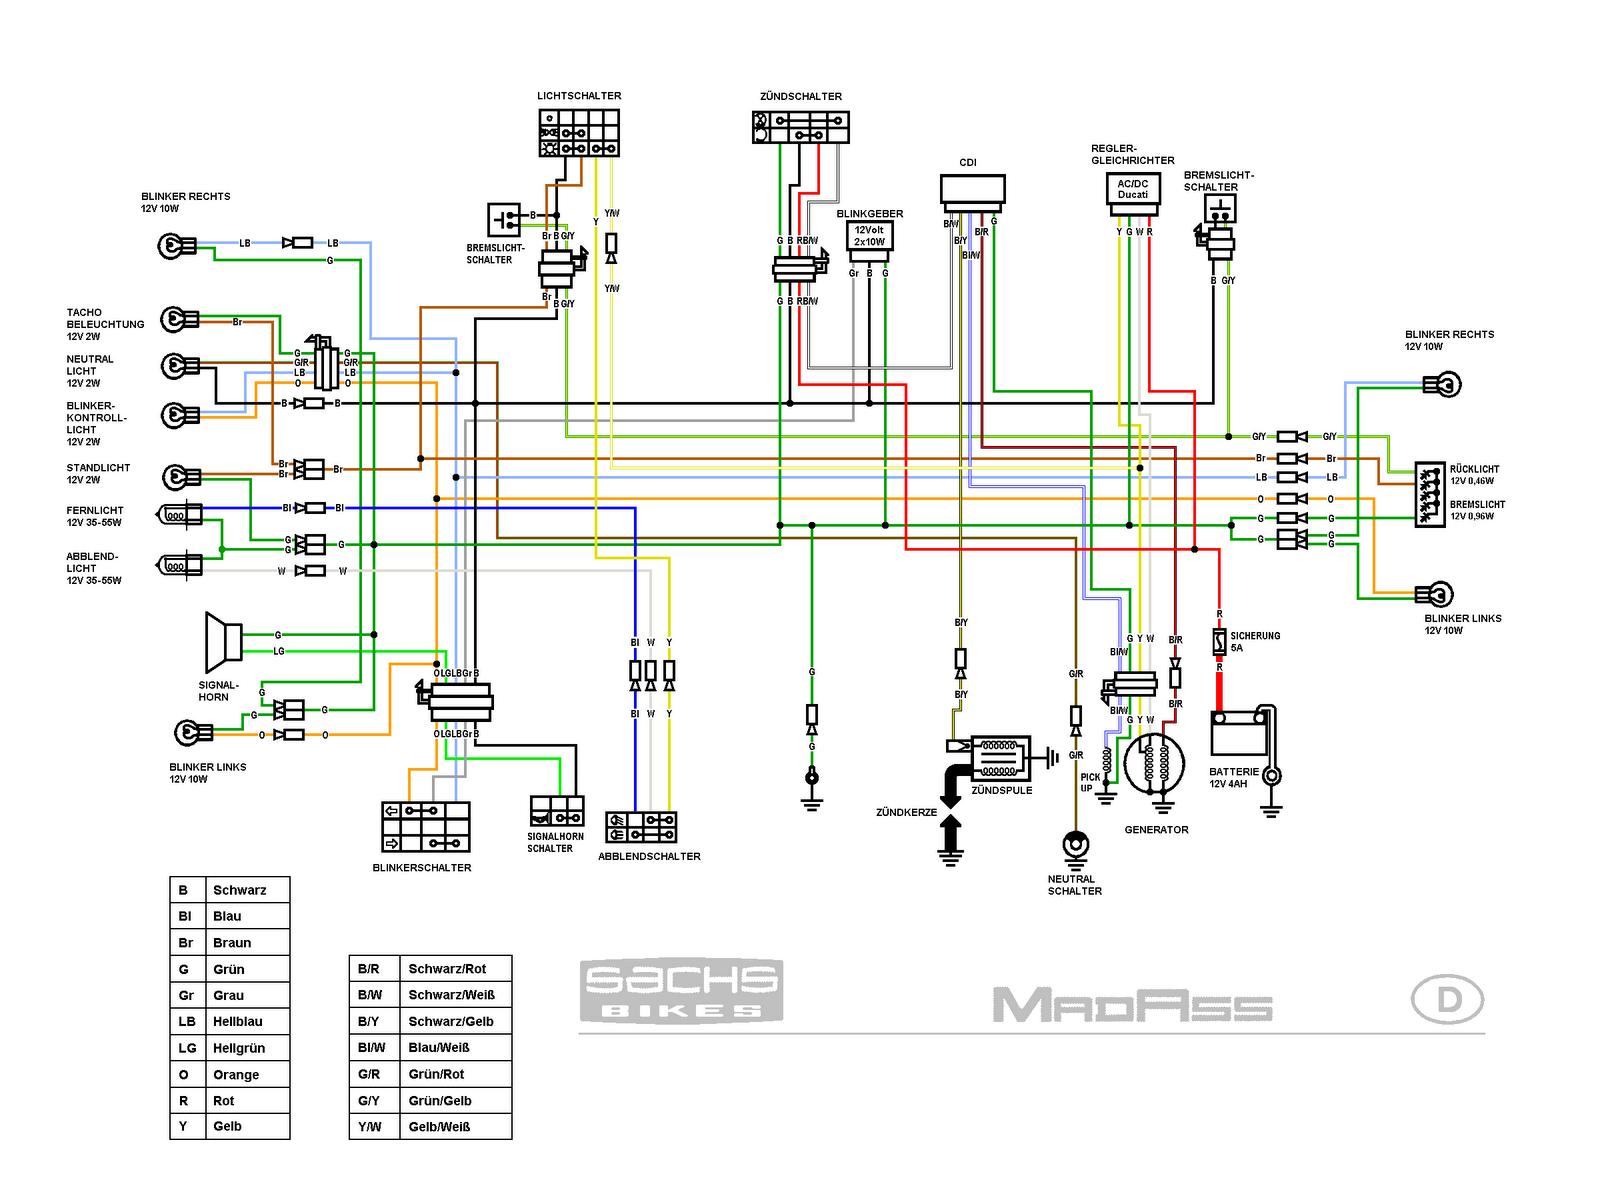 Honda Wiring Diagram In Addition Honda 300 Wiring Diagram To Starter